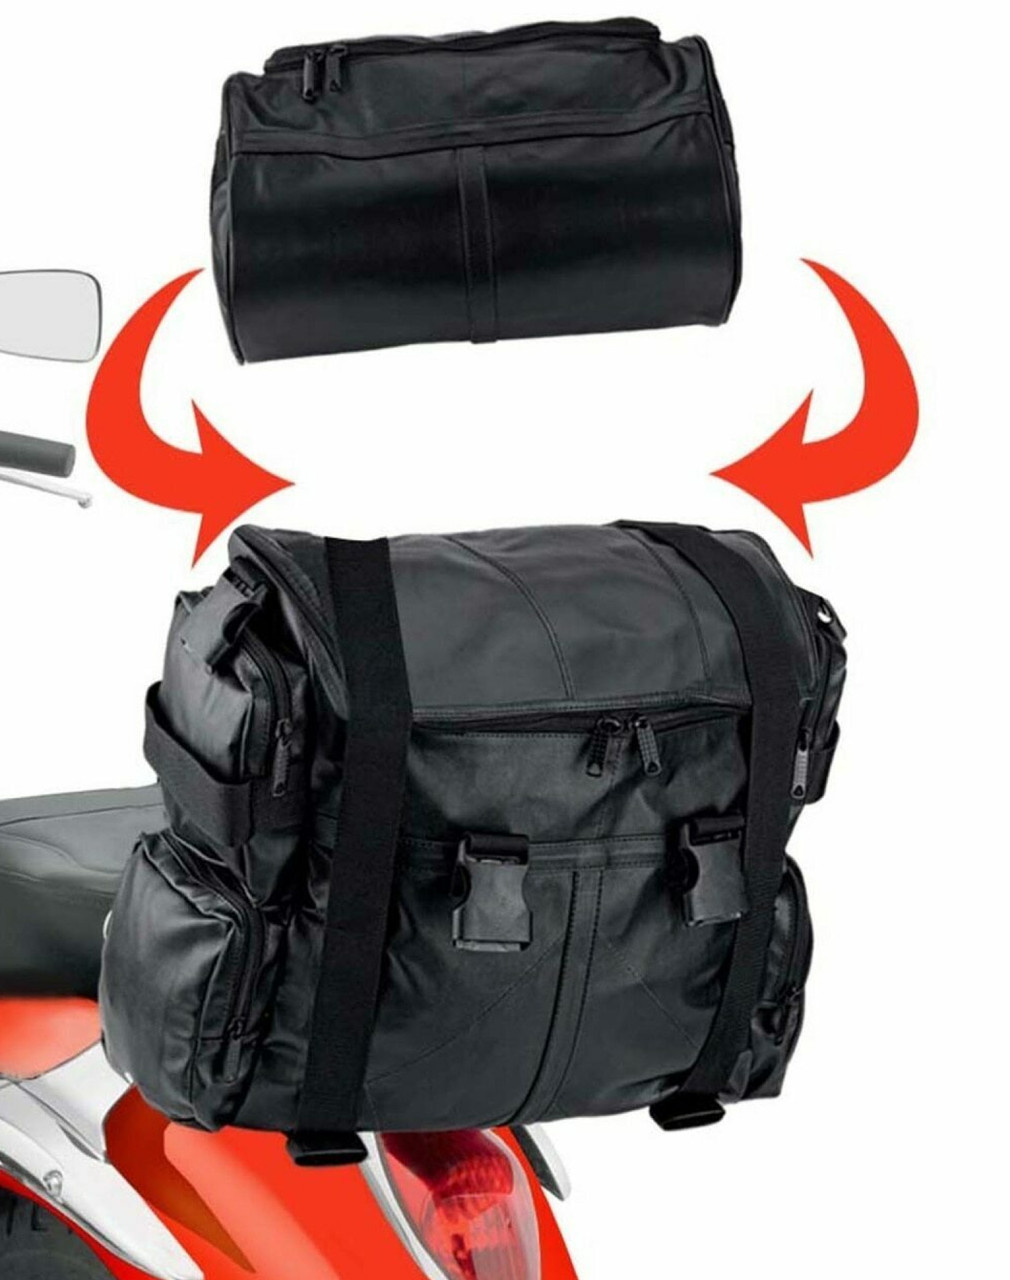 Honda Viking Aero Medium Expandable Motorcycle Sissy Bar Bag Roll Bag